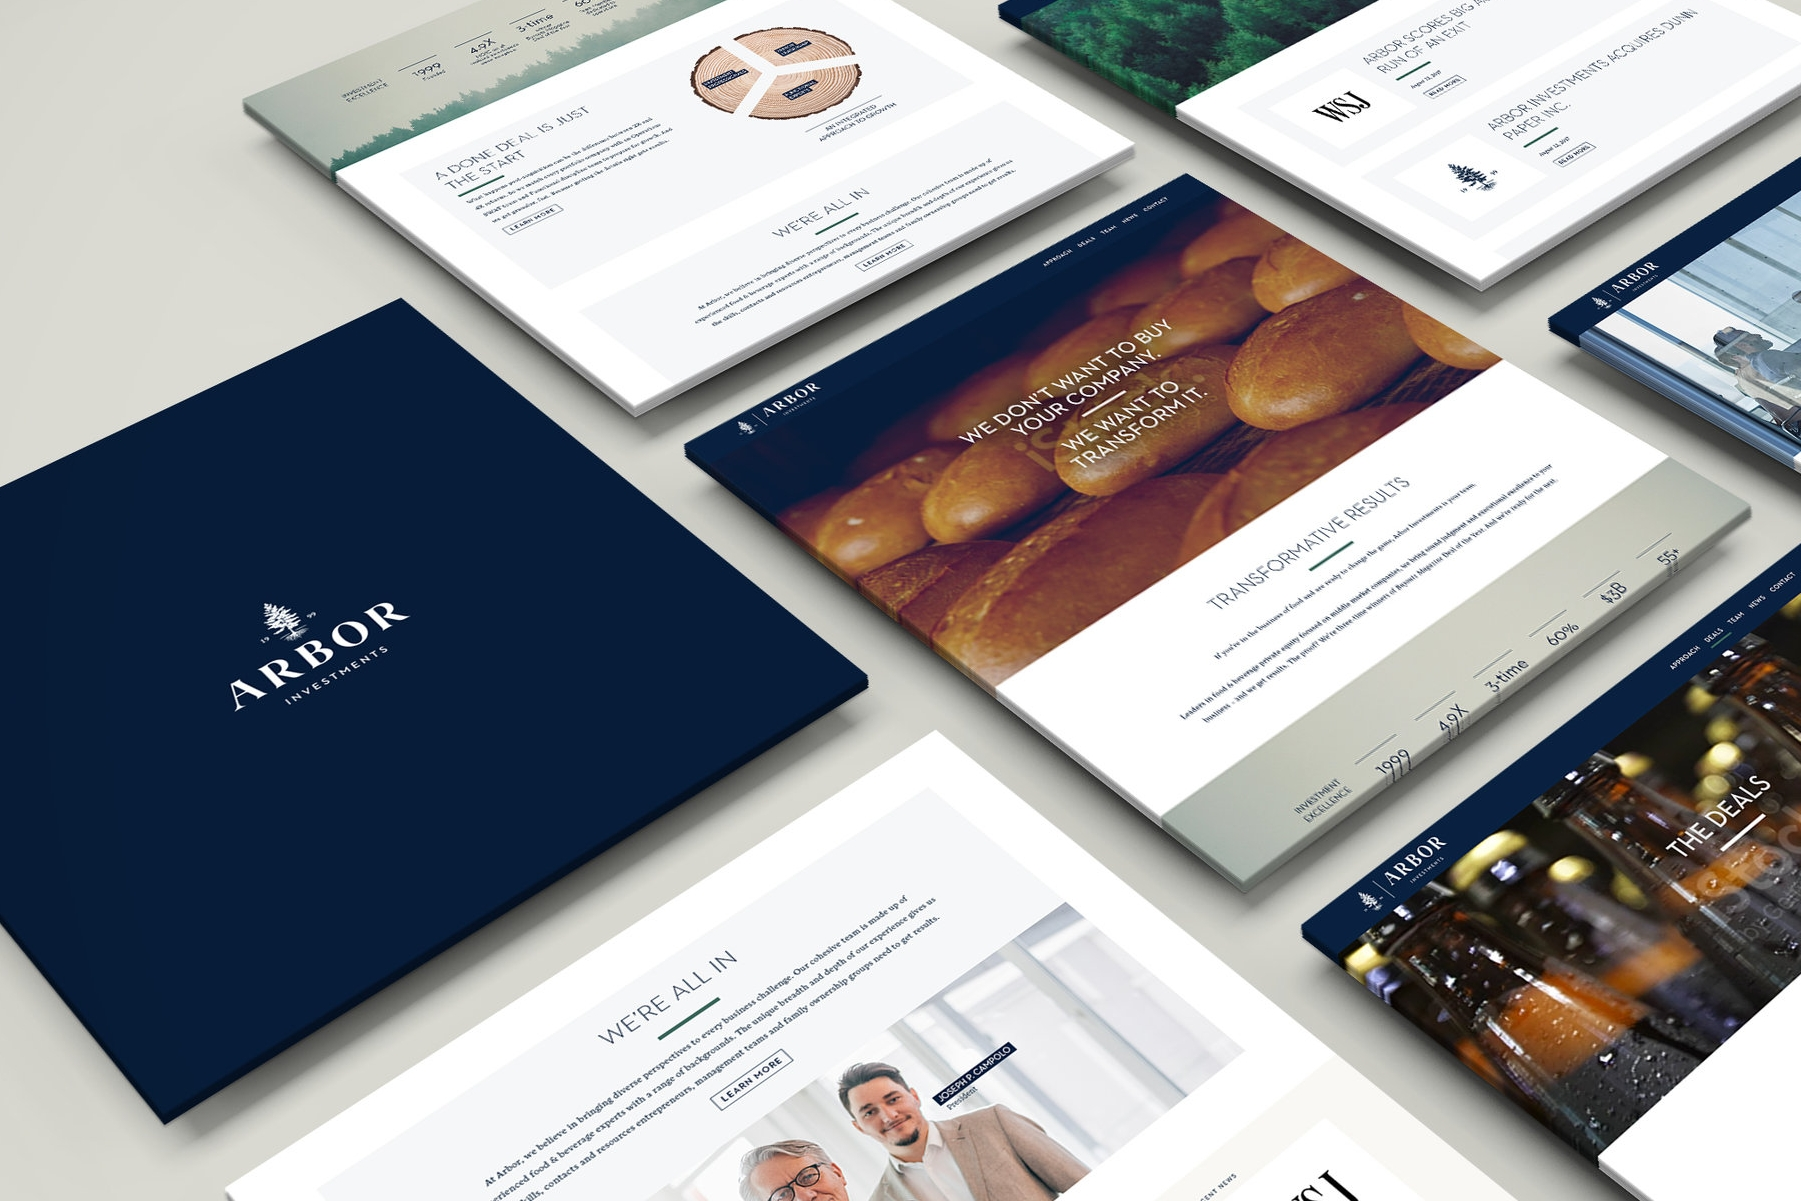 Arbor Investments - Website redesign